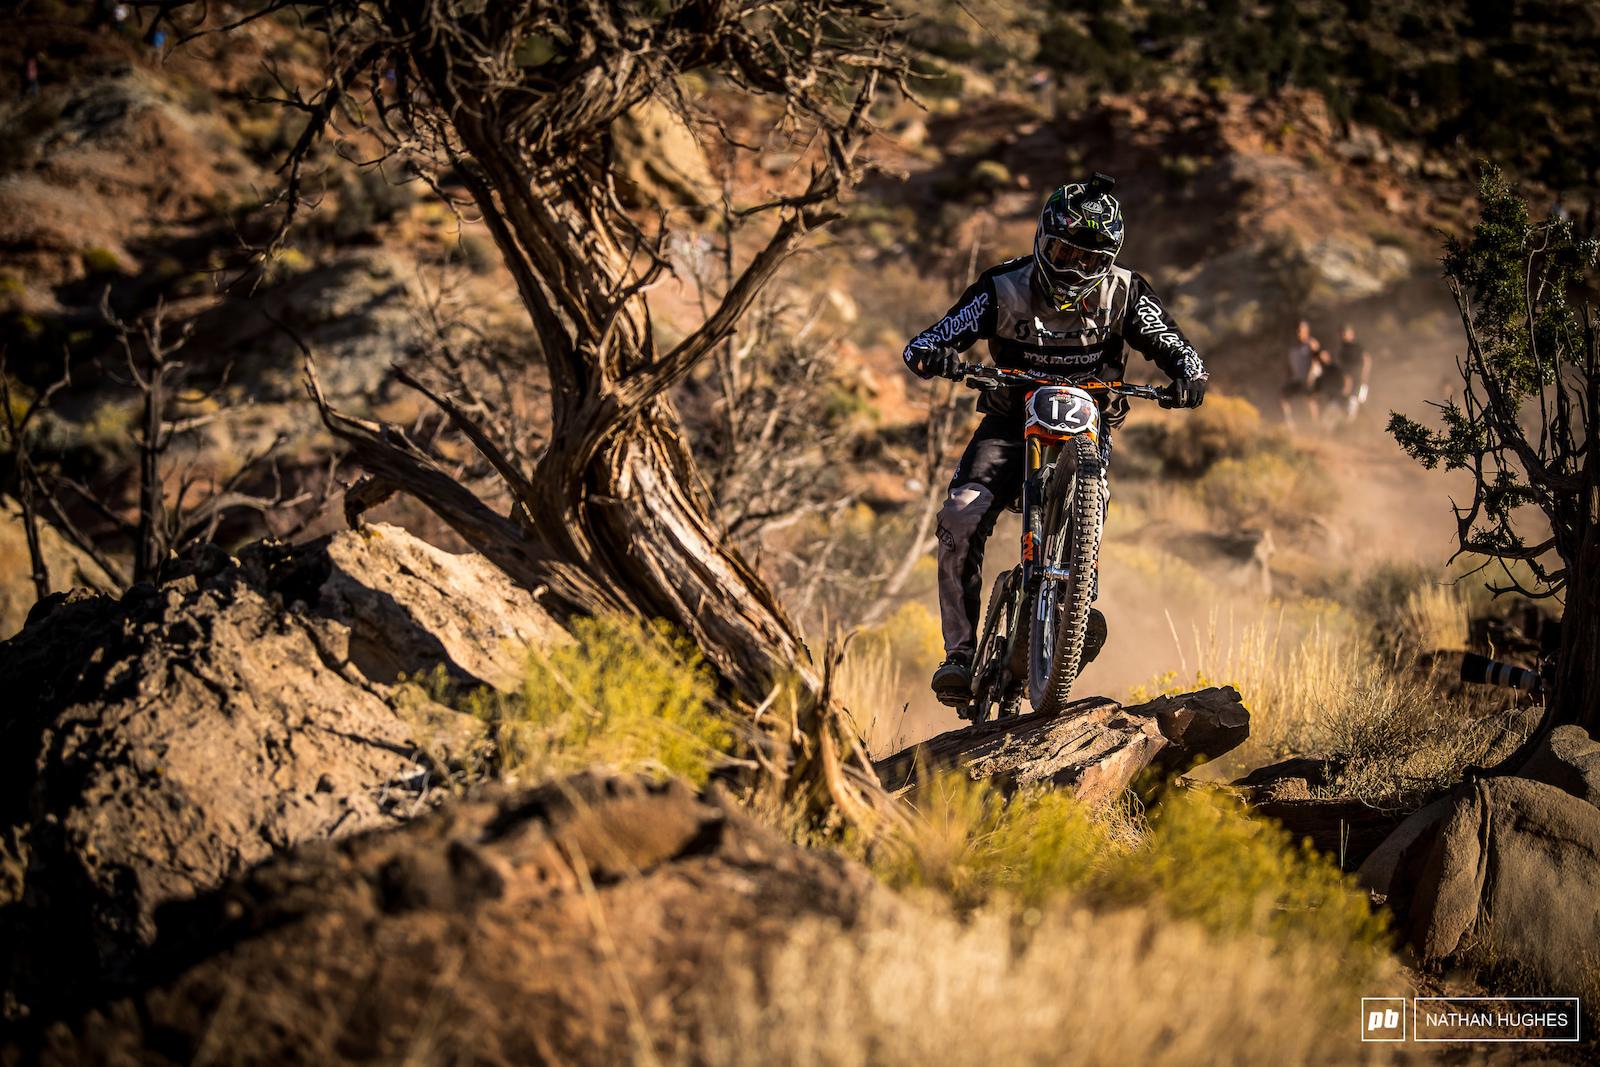 Brendan making his way down through some unfamiliar Rampage terrain en route to the canyon gap.